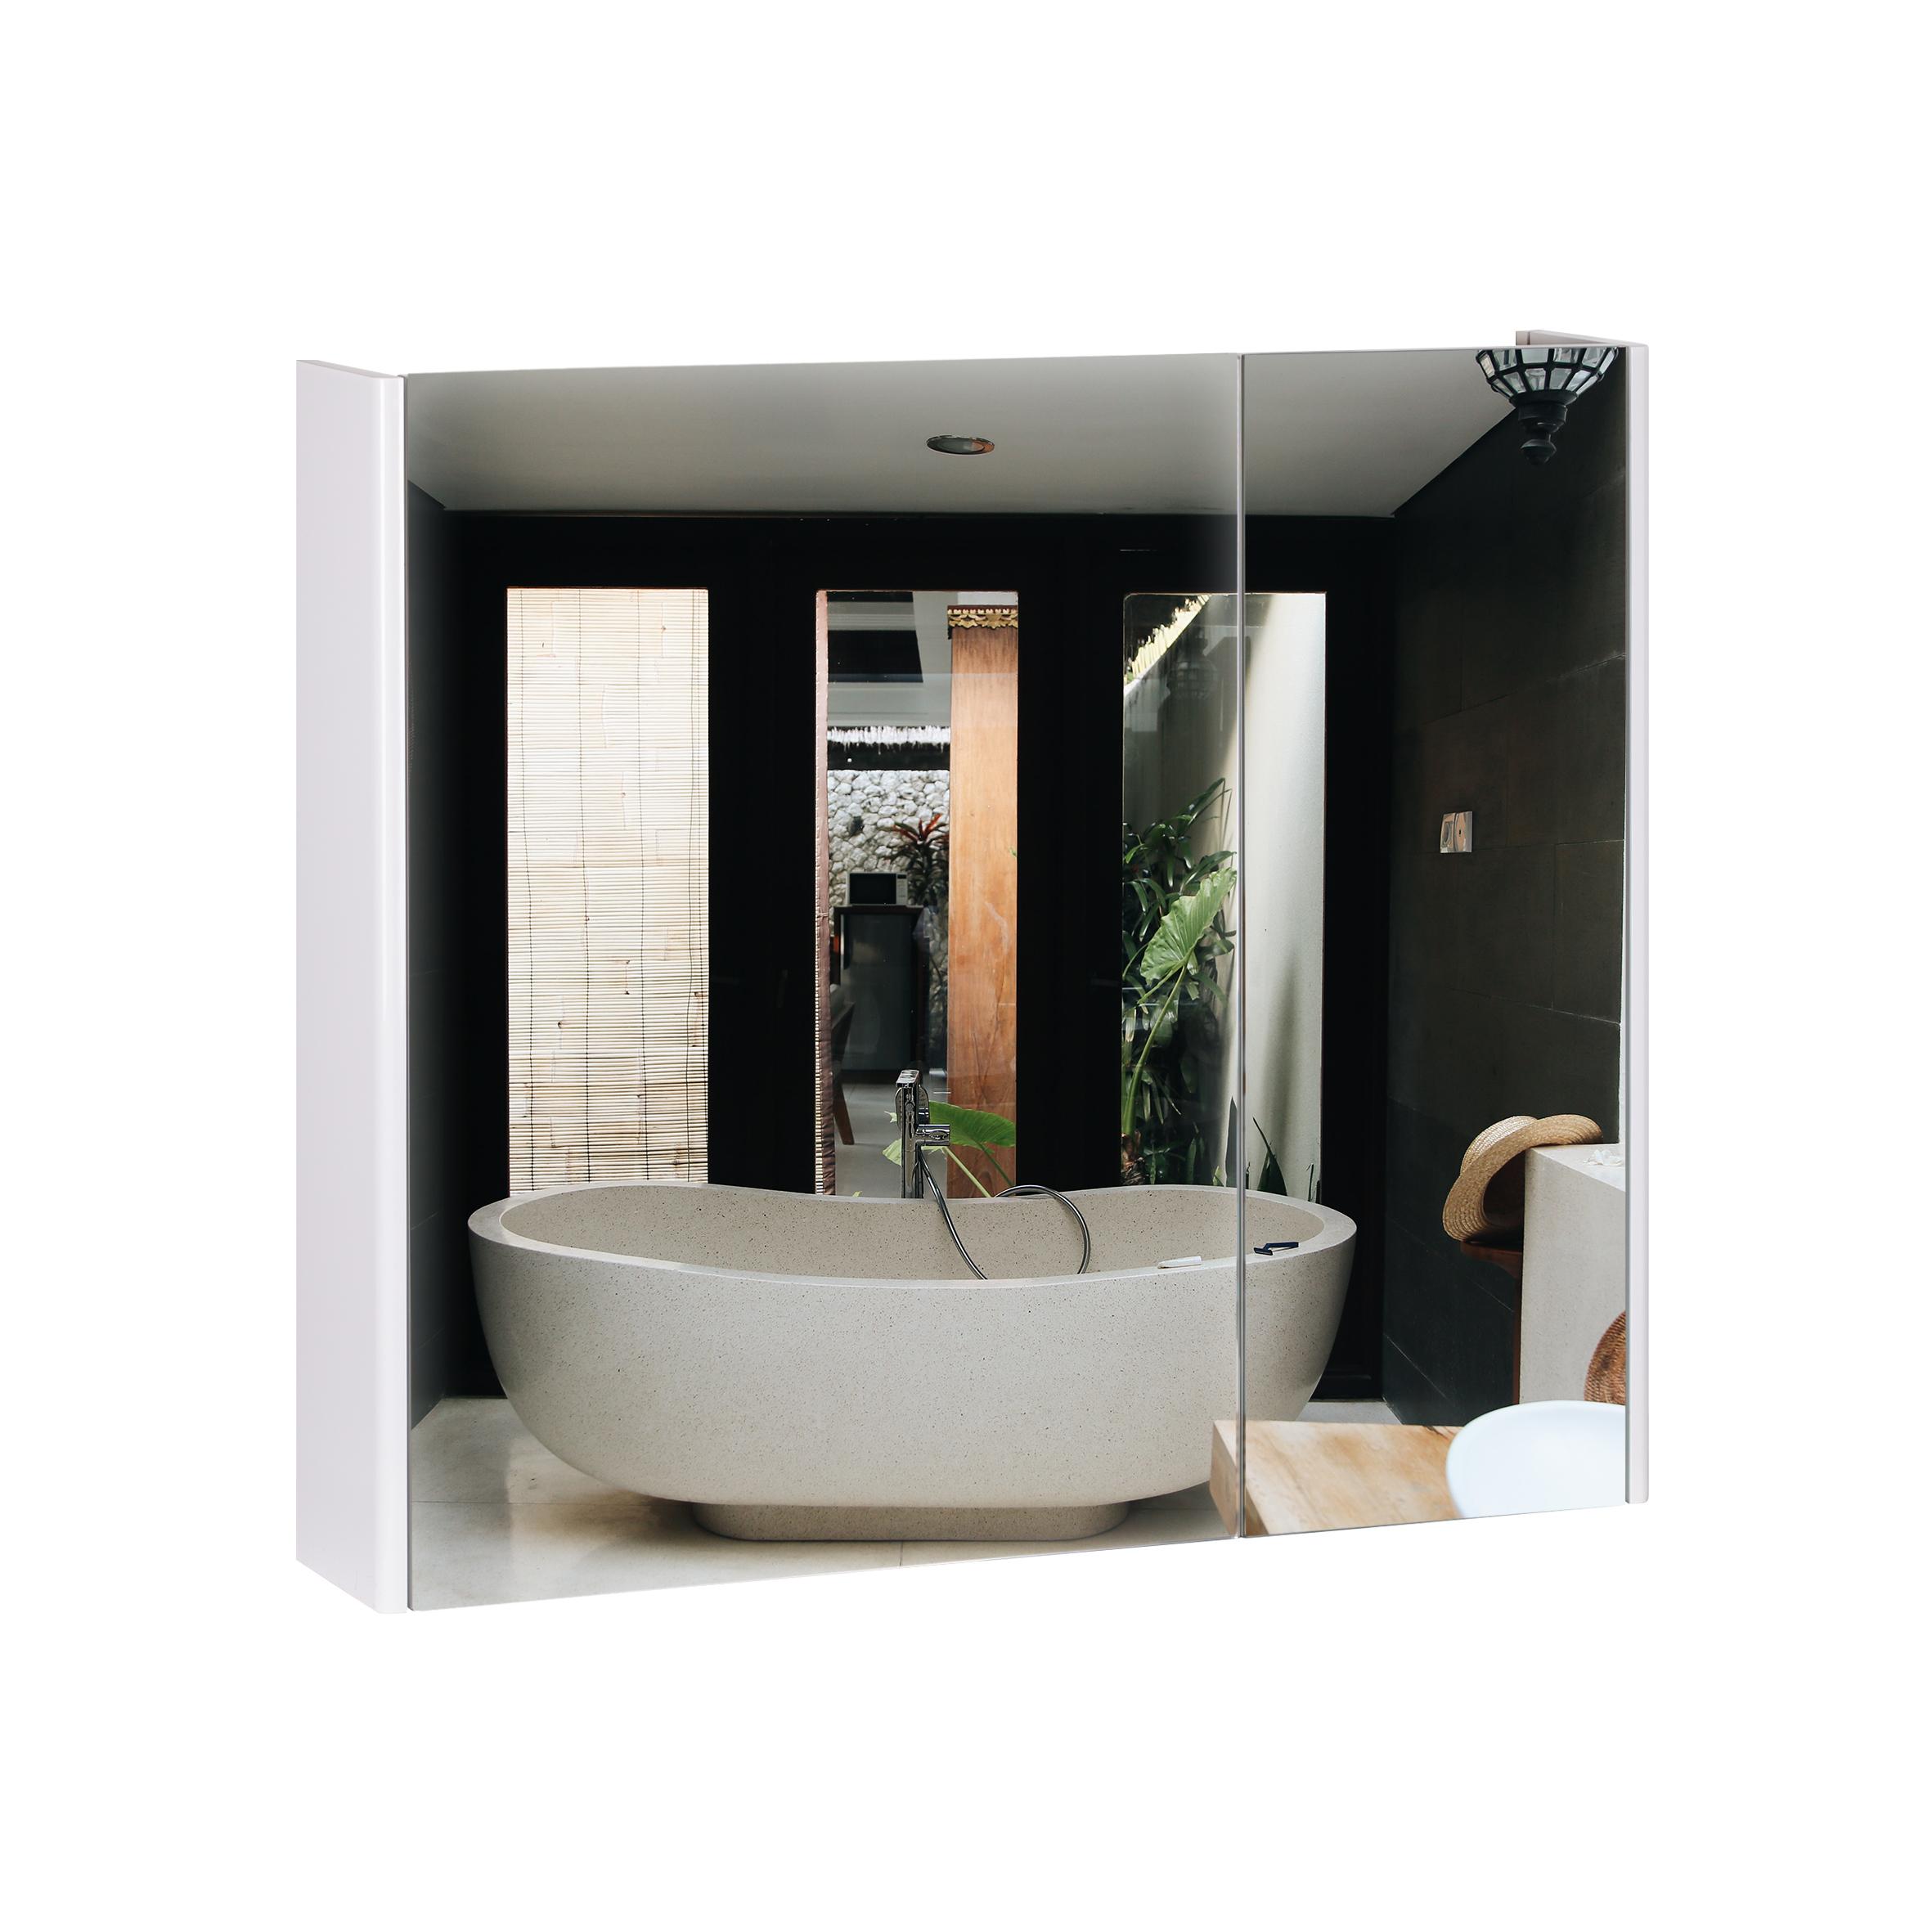 Зеркальный шкаф подвесной Qtap Scorpio 700х600х145 White QT1477ZP701W